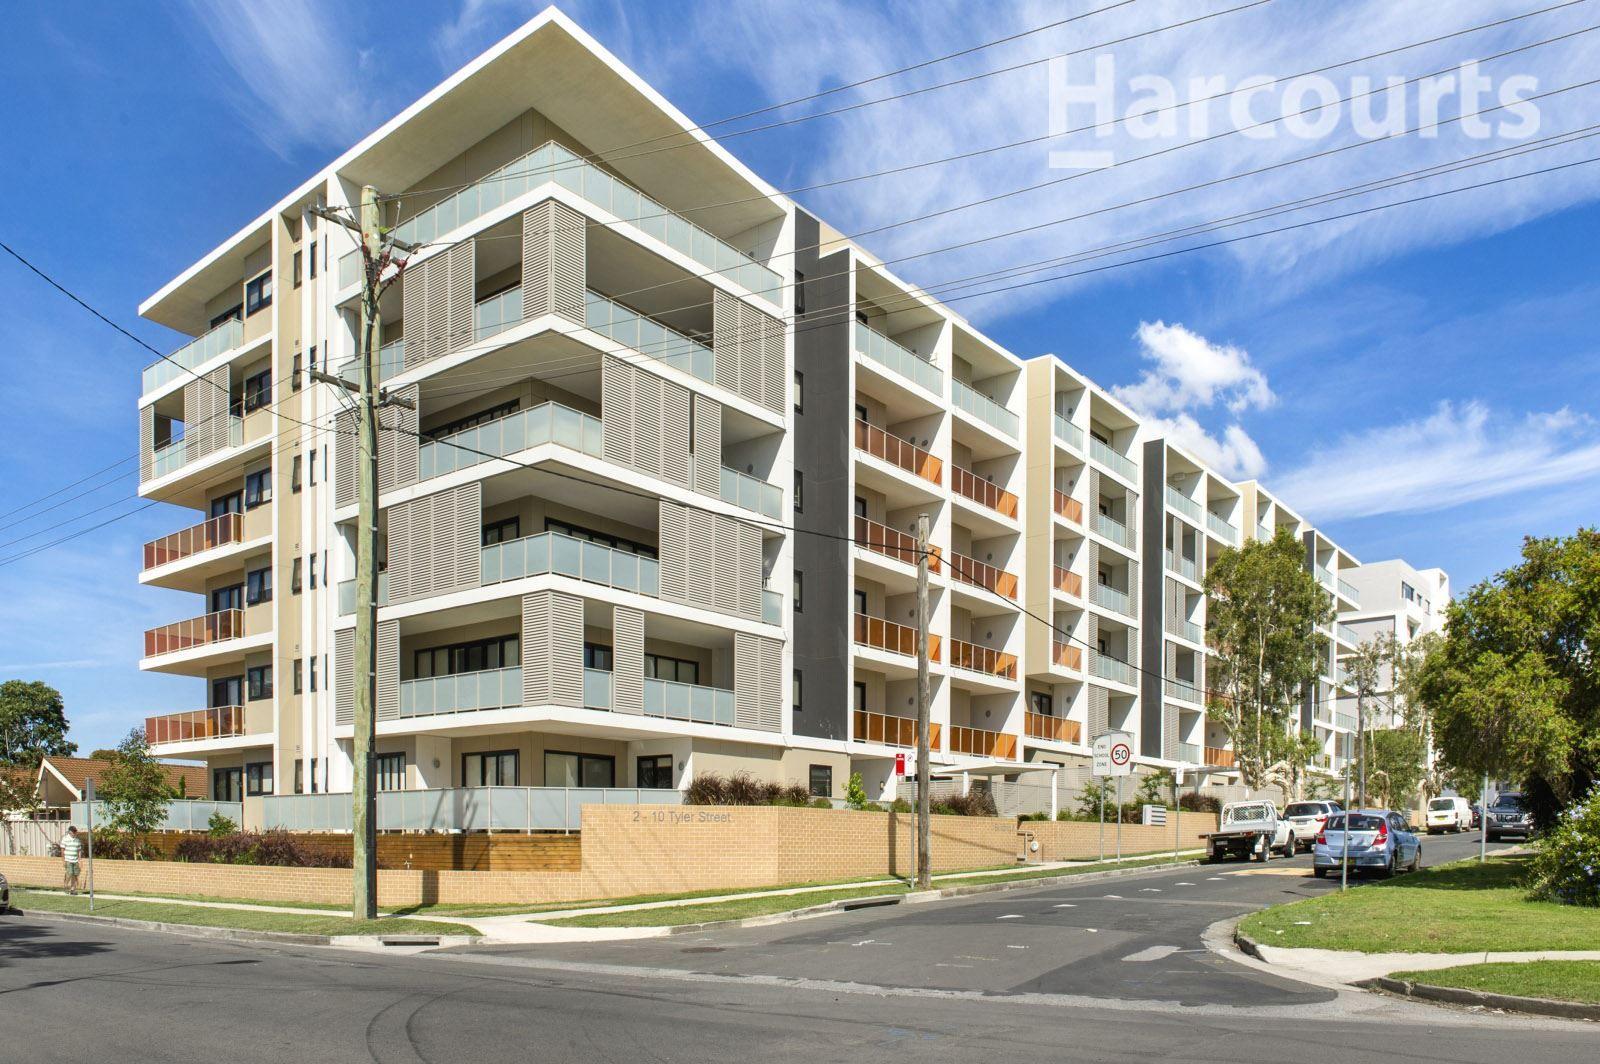 20/2-10 Tyler Street, Campbelltown NSW 2560, Image 0